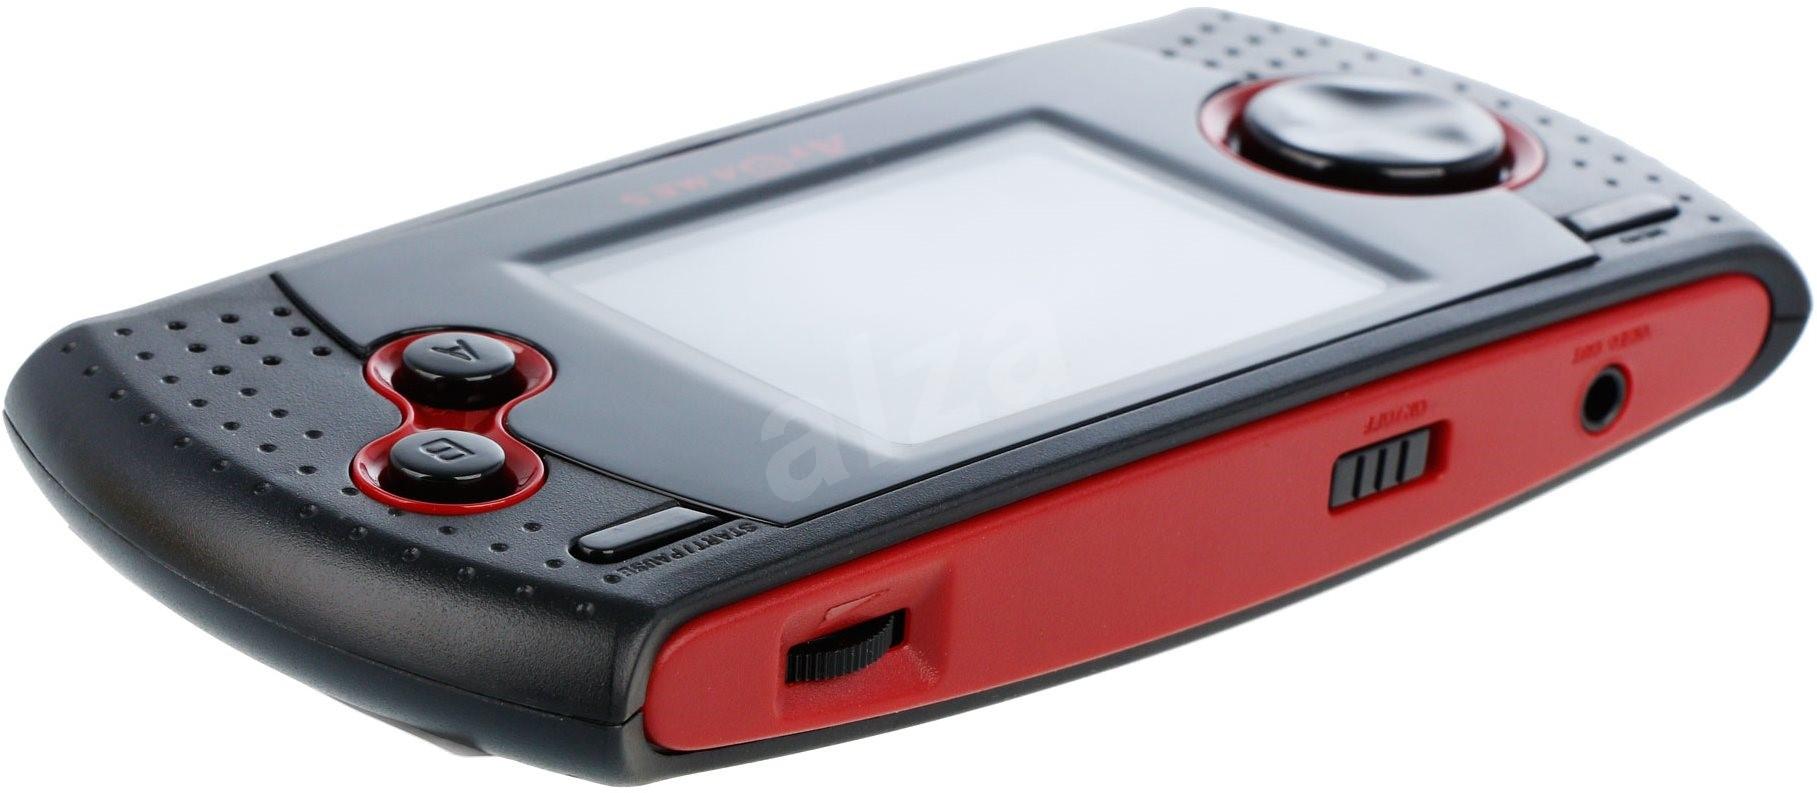 Sega master system game gear handheld console game console - Sega master system console for sale ...